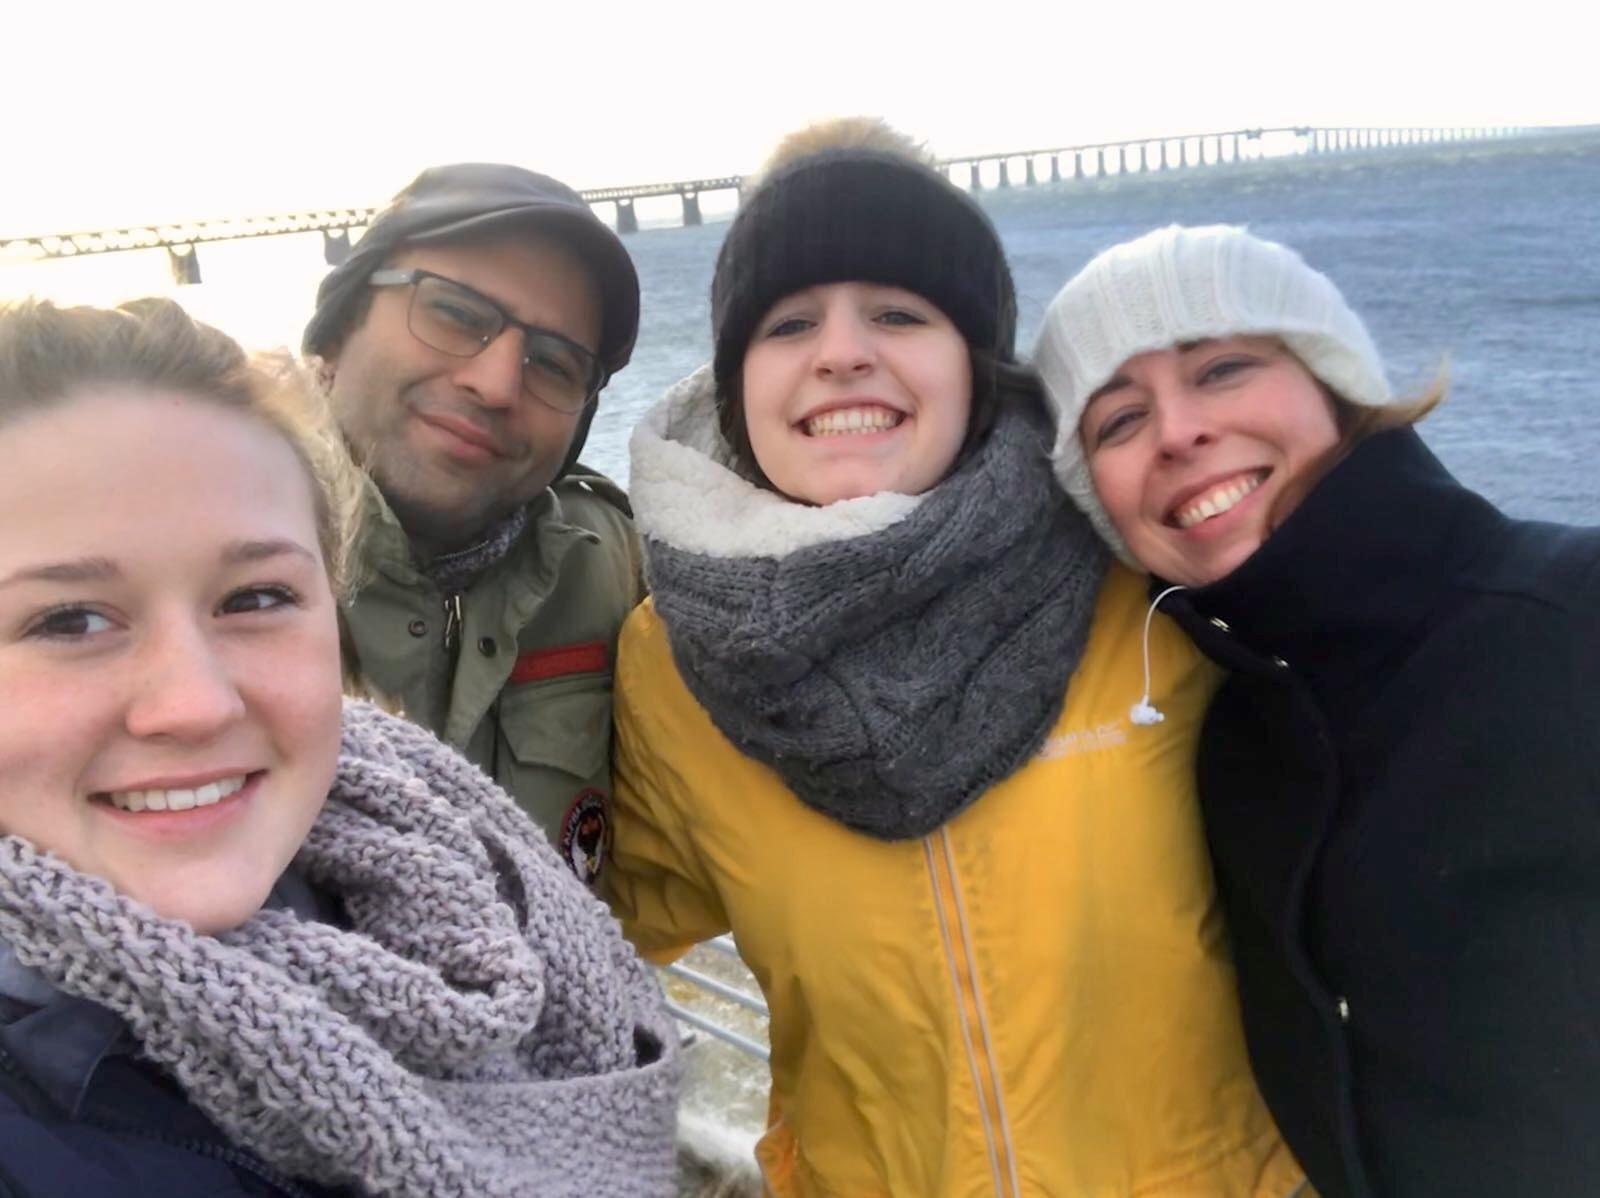 (l-r) Amber Fuller, Matthew Reza Afzali, Amy Fuller, Jude Hankinson